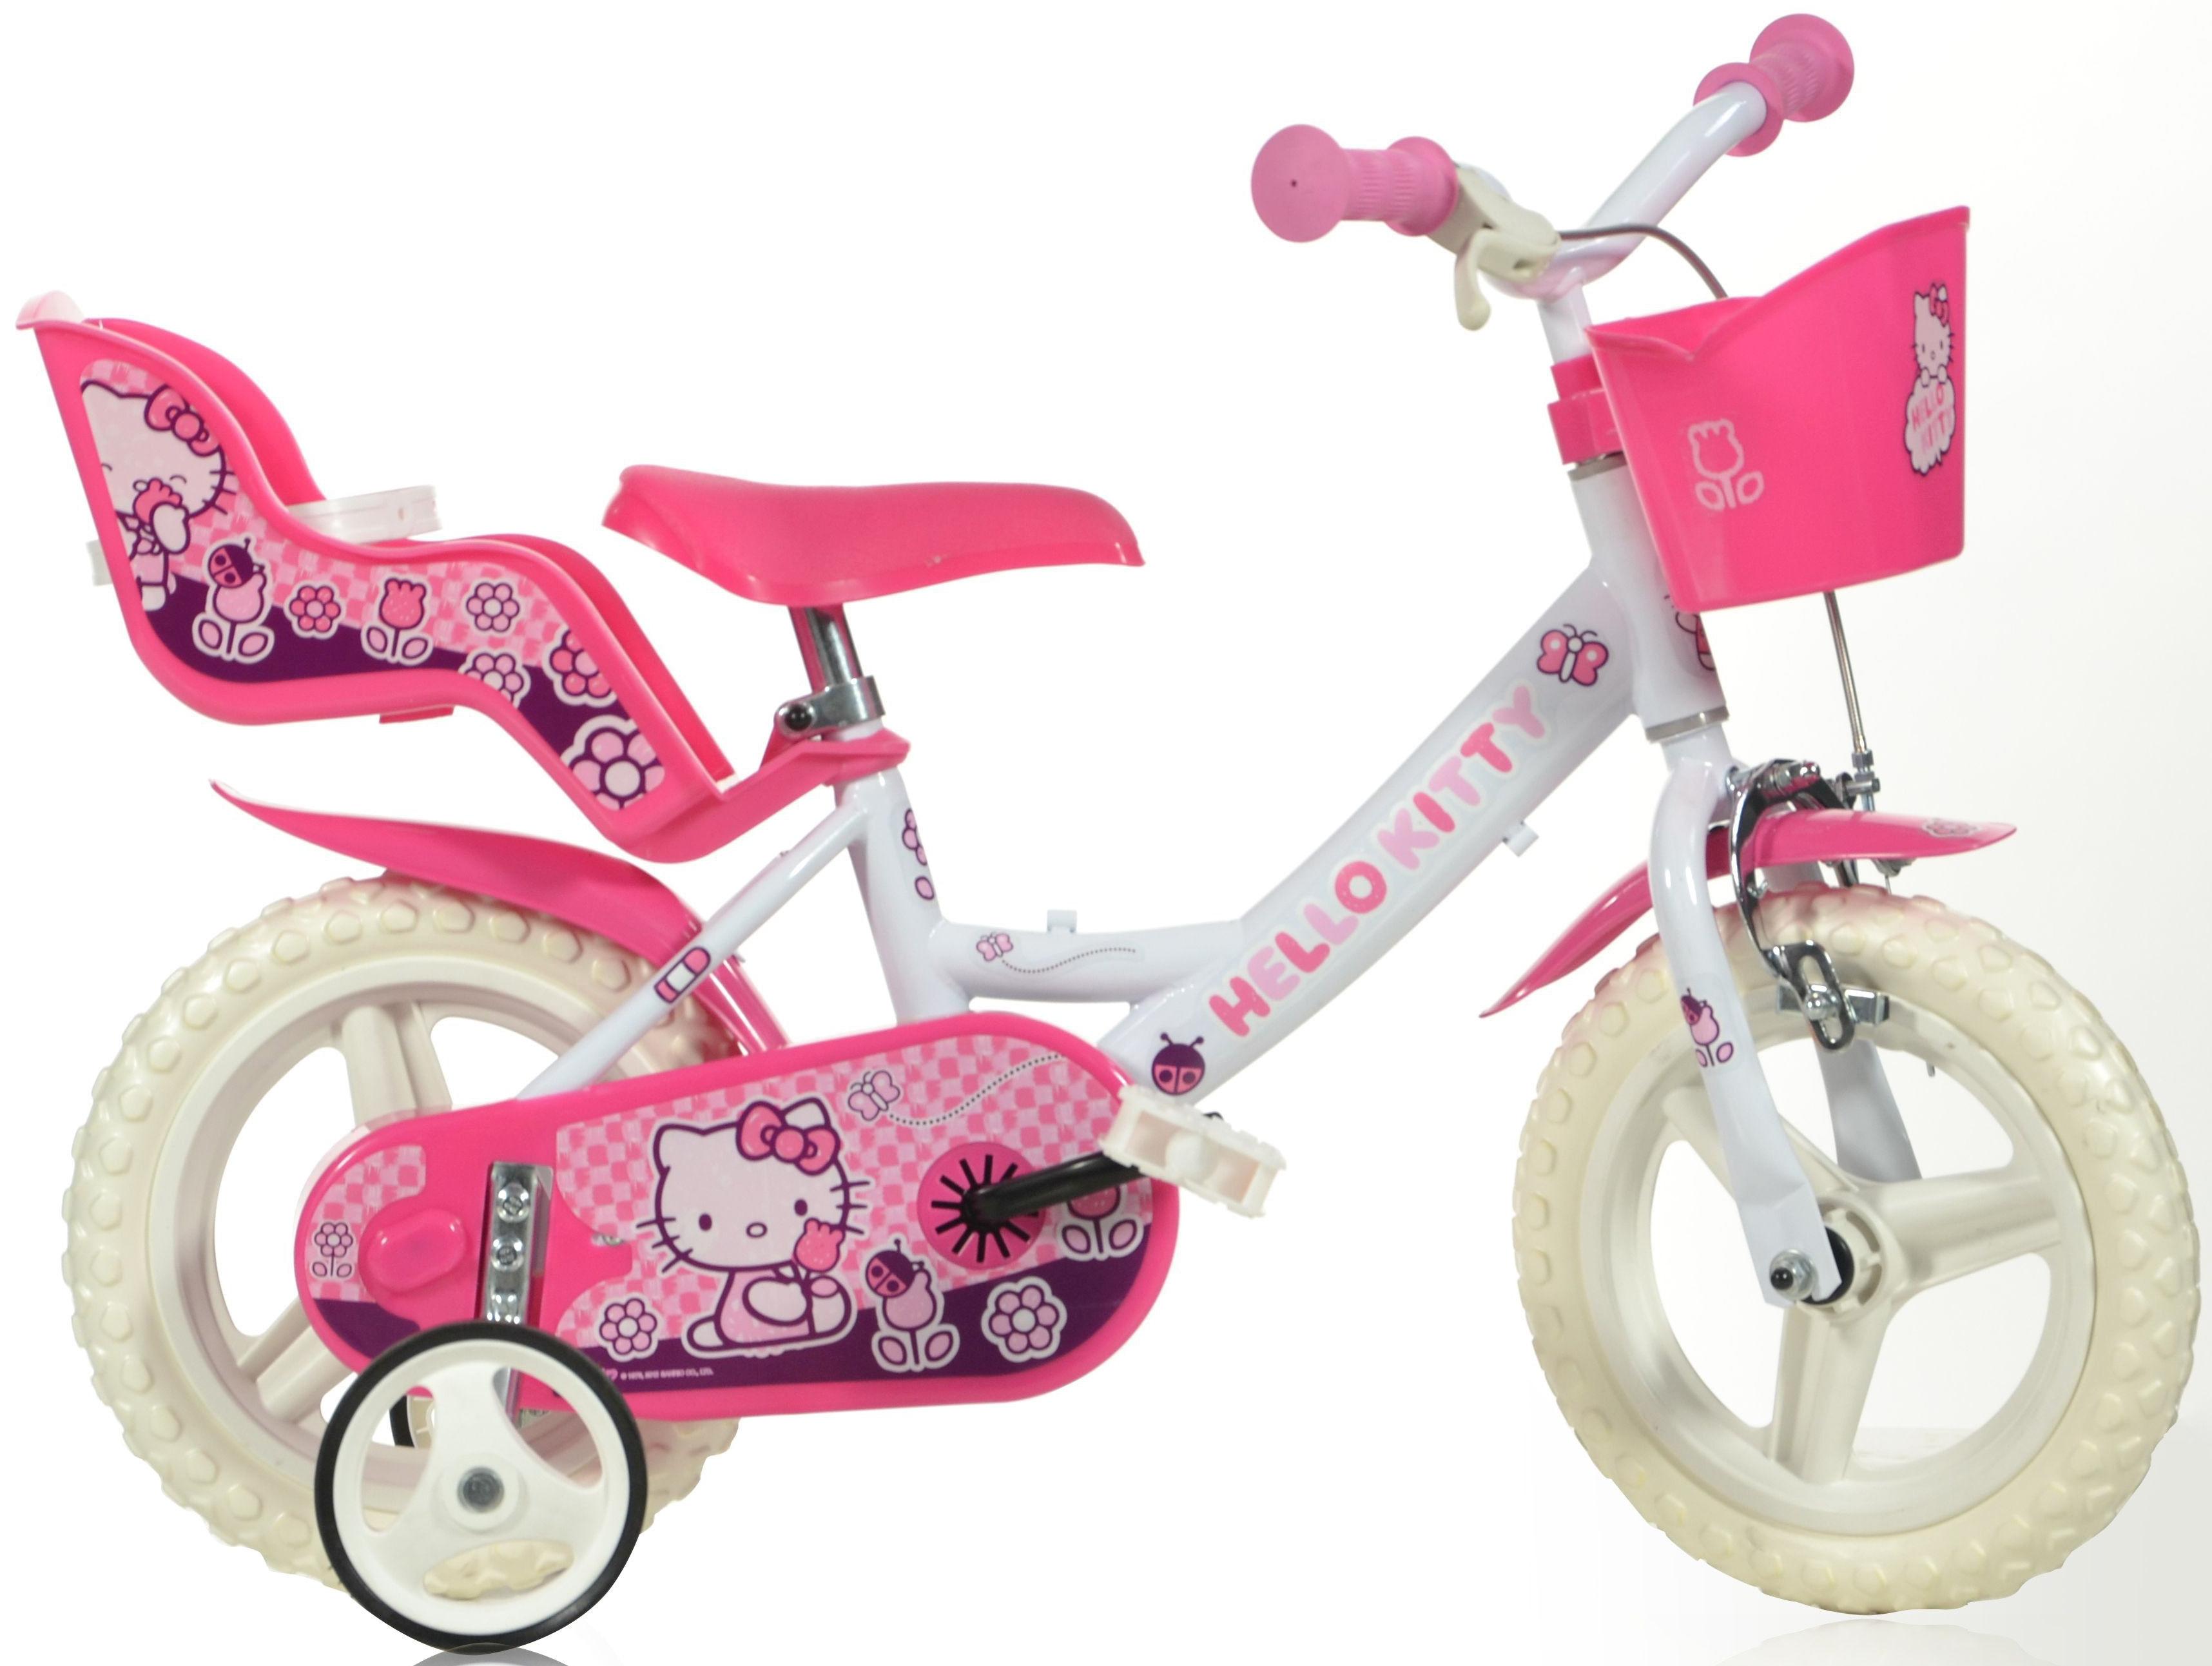 Hello Kitty Kinderfahrrad Kitty, mit Lenkerkorb + Puppensitz rosa Kinder Kinderfahrräder Fahrräder Zubehör